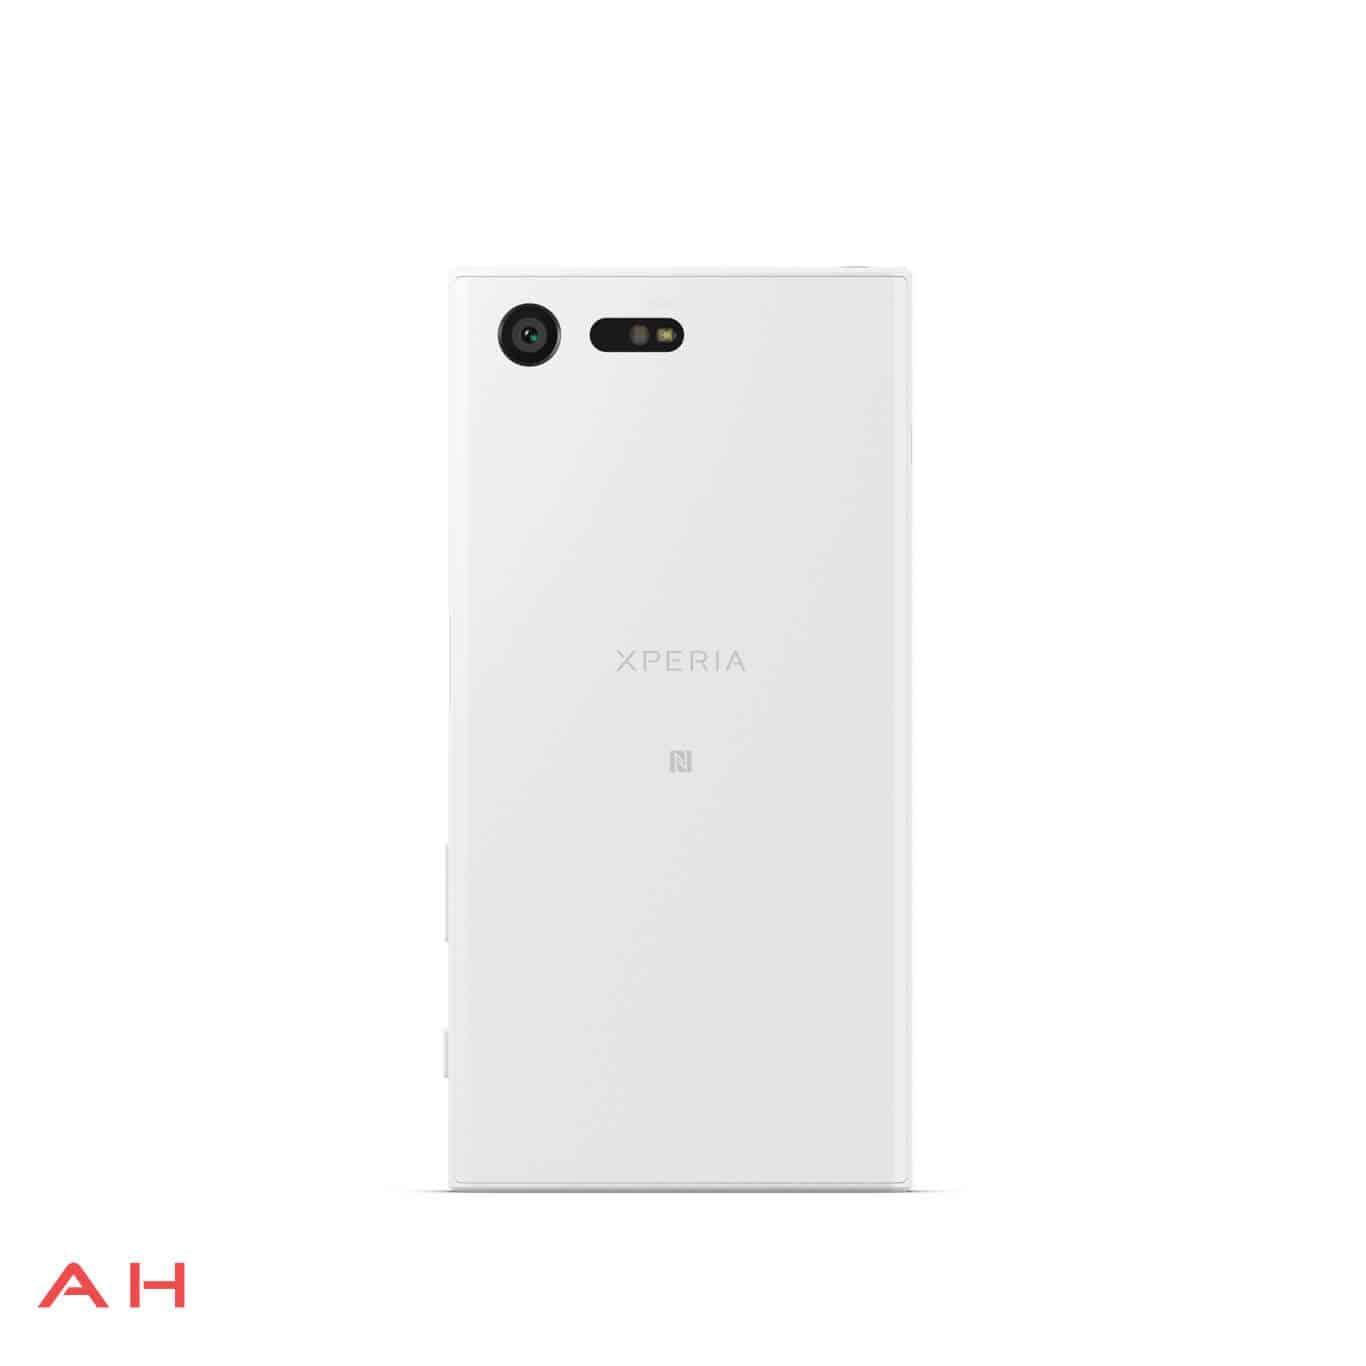 Sony Xperia X Compact AH 7